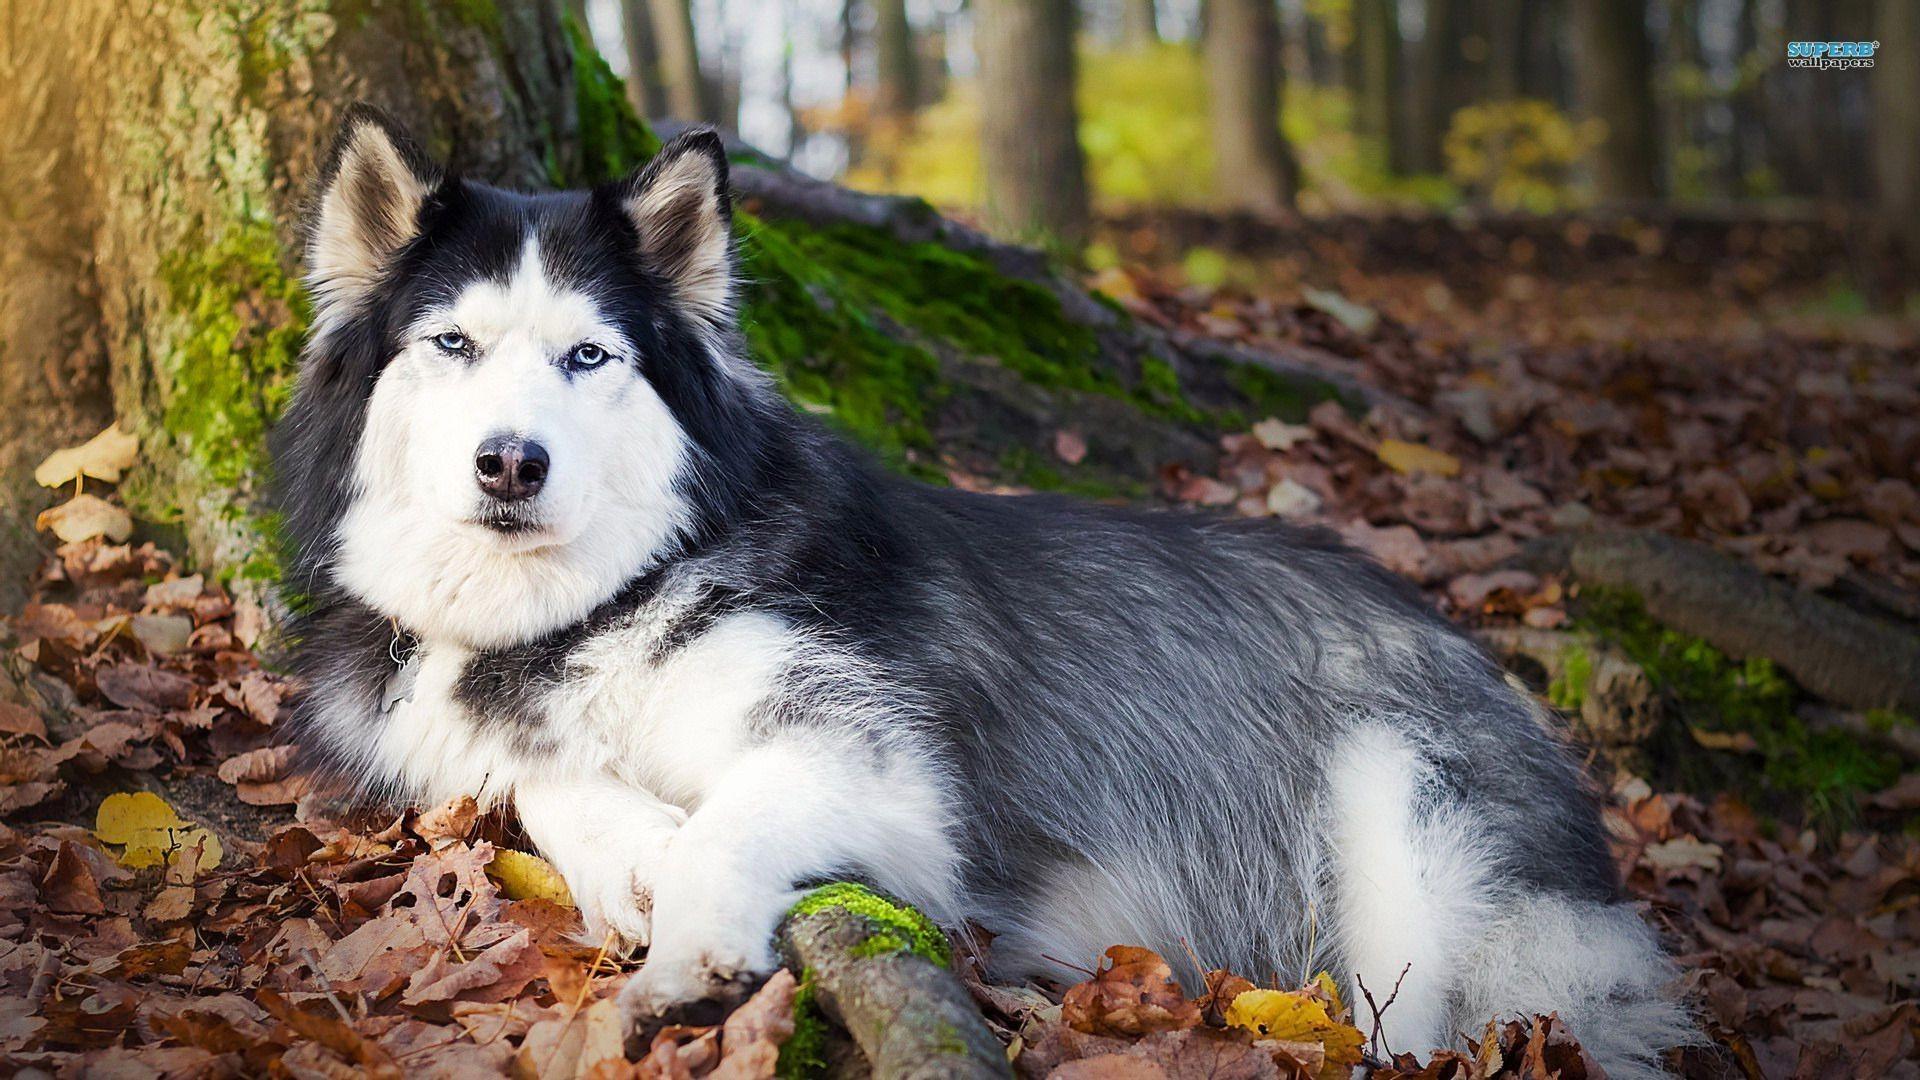 Siberian Husky wallpaper – Animal wallpapers – #16079